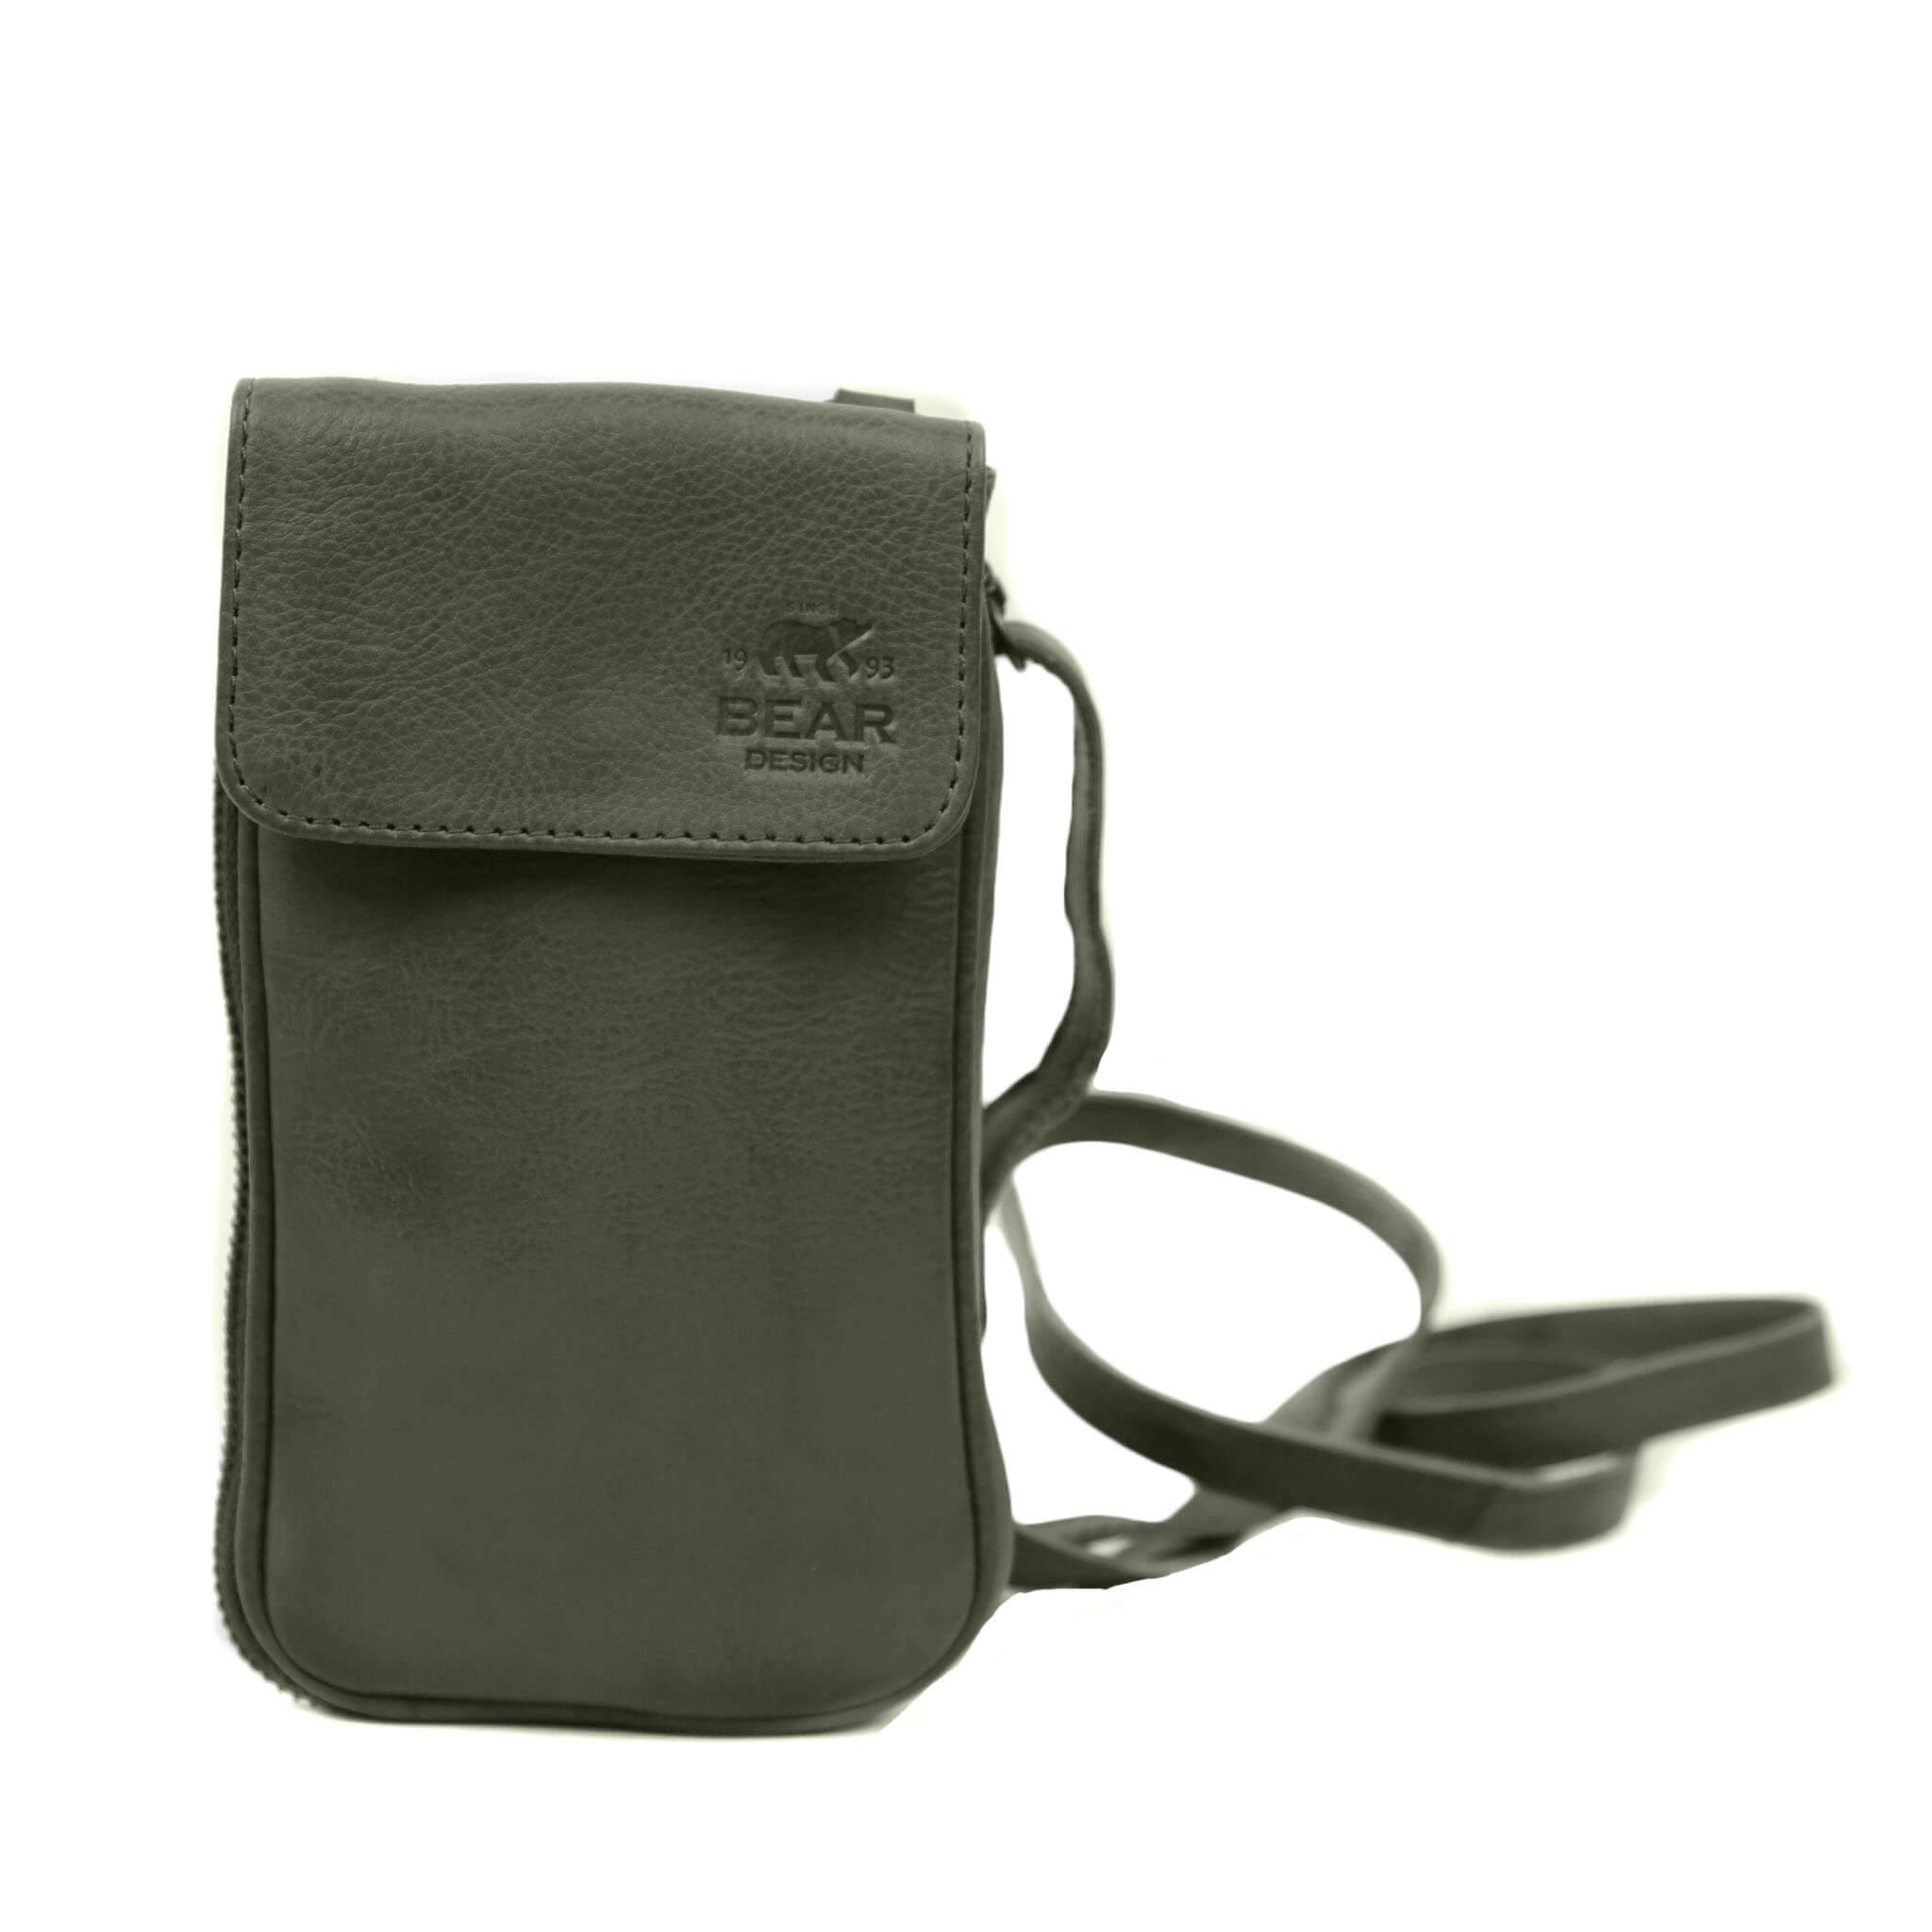 Bear Design Phone Bag Ahana Telefoontasje Groen